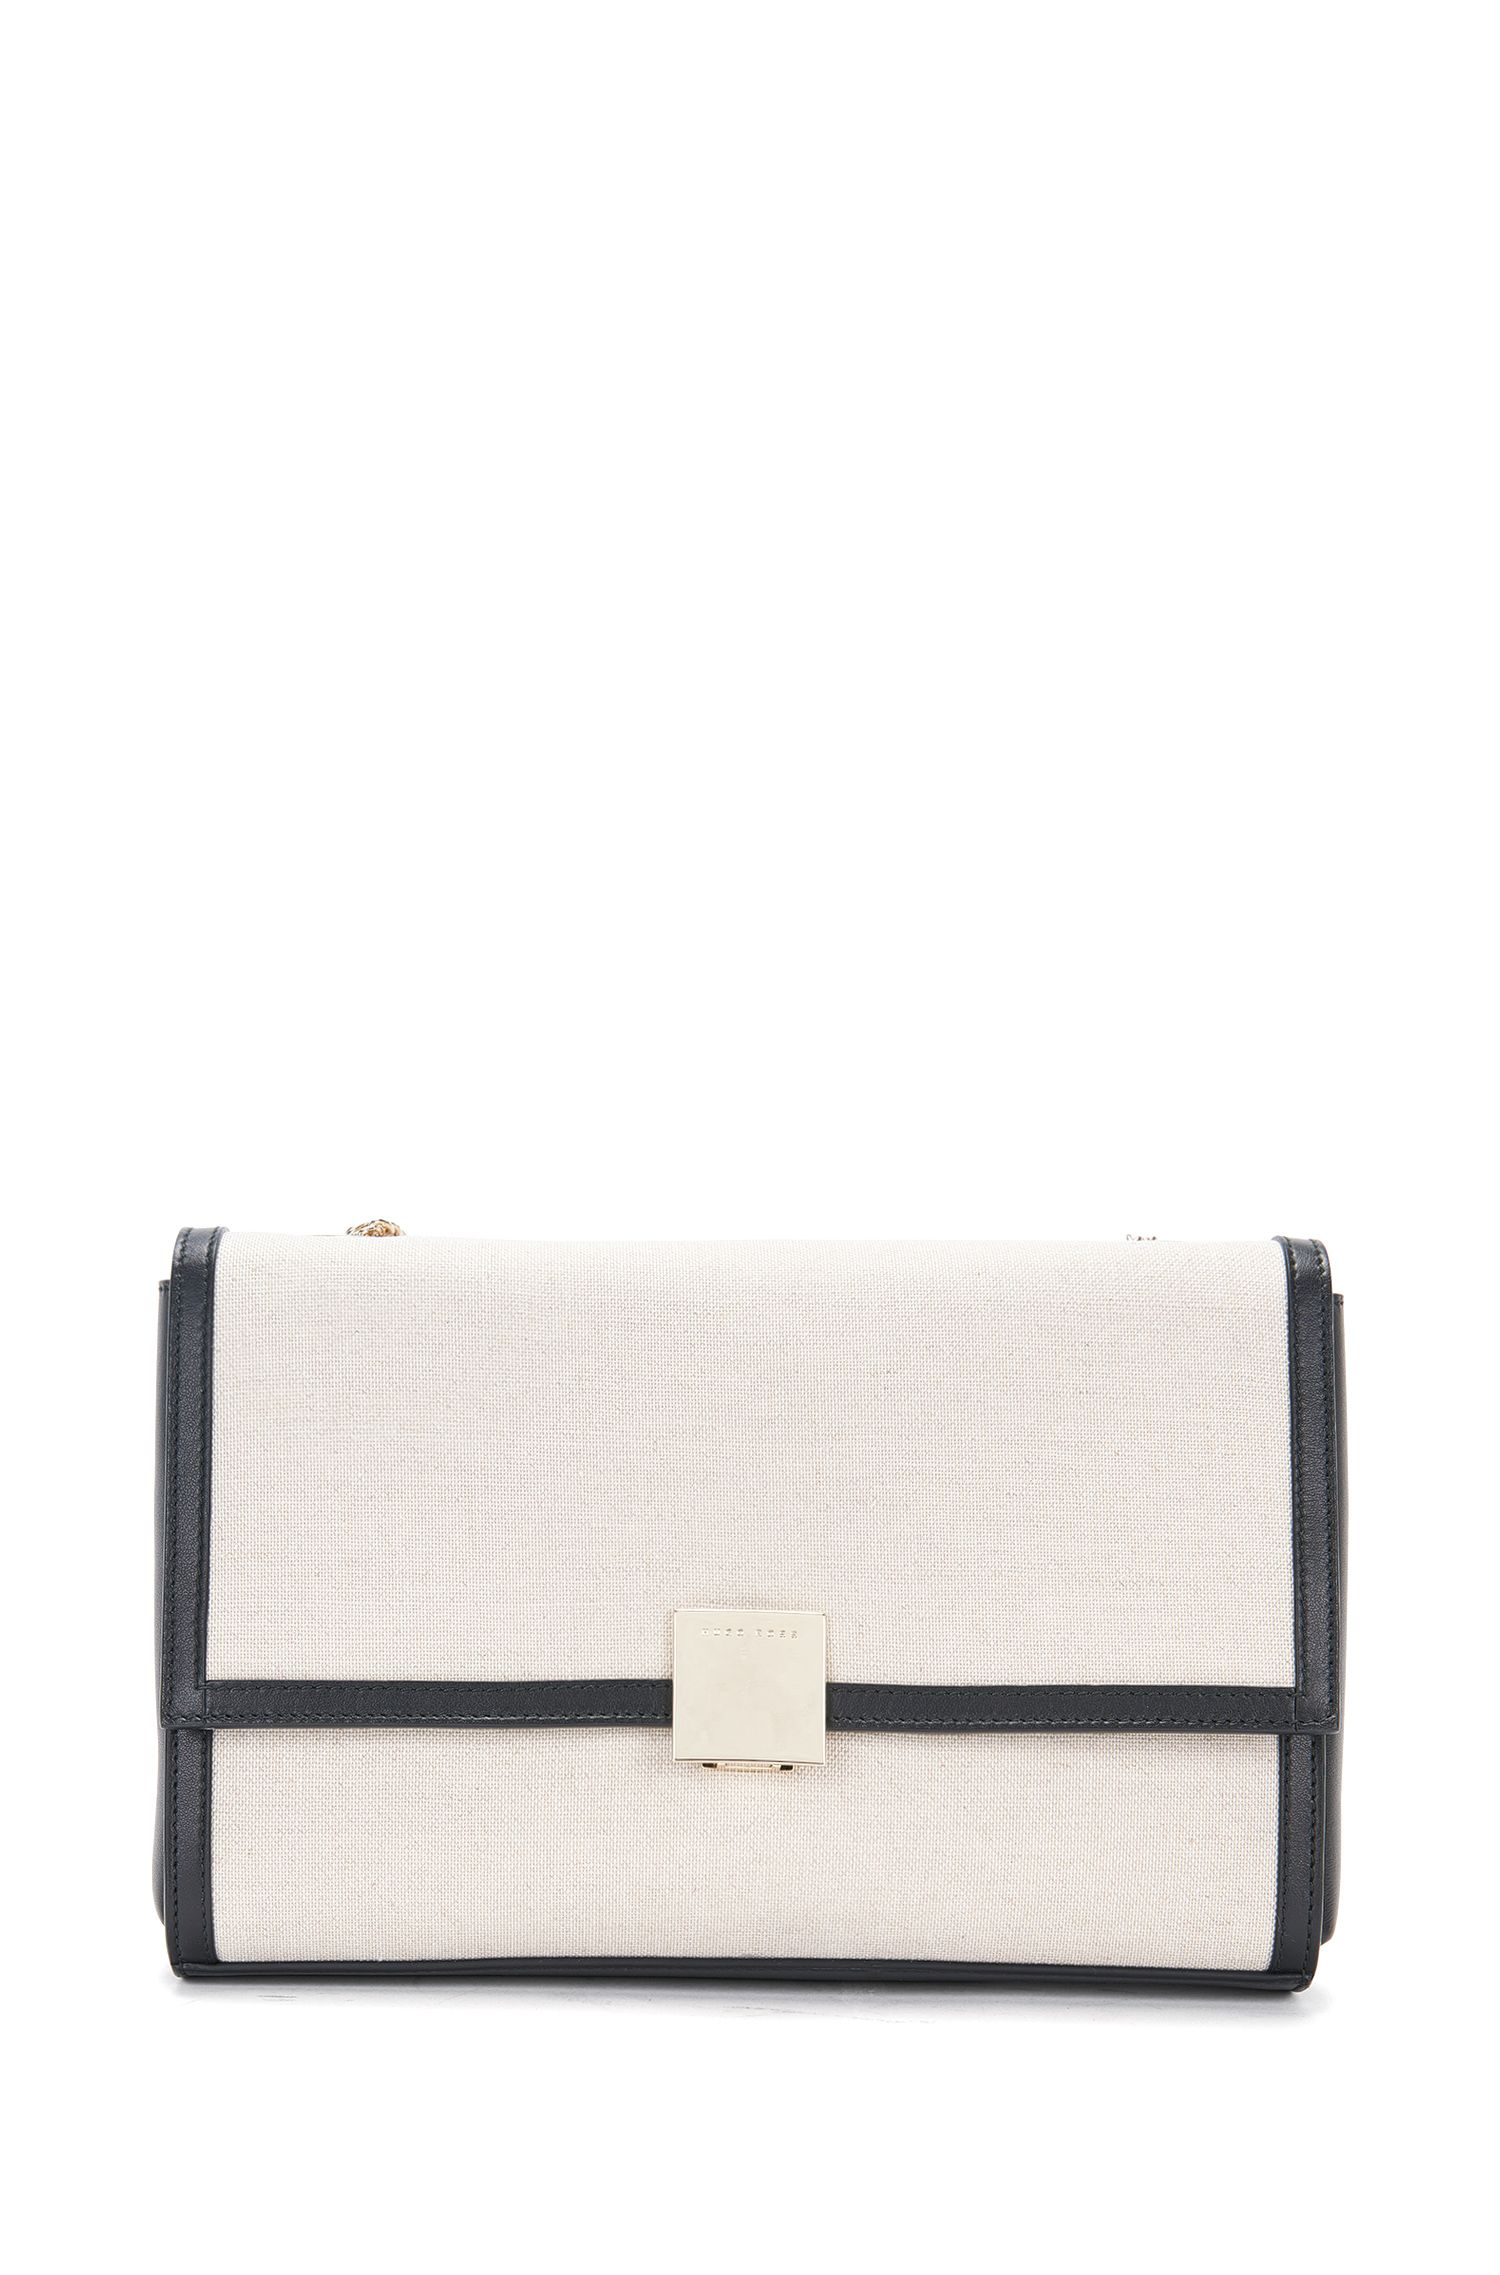 'Munich Flap SC' | Italian Cotton Linen Leather Handbag, Chain Strap